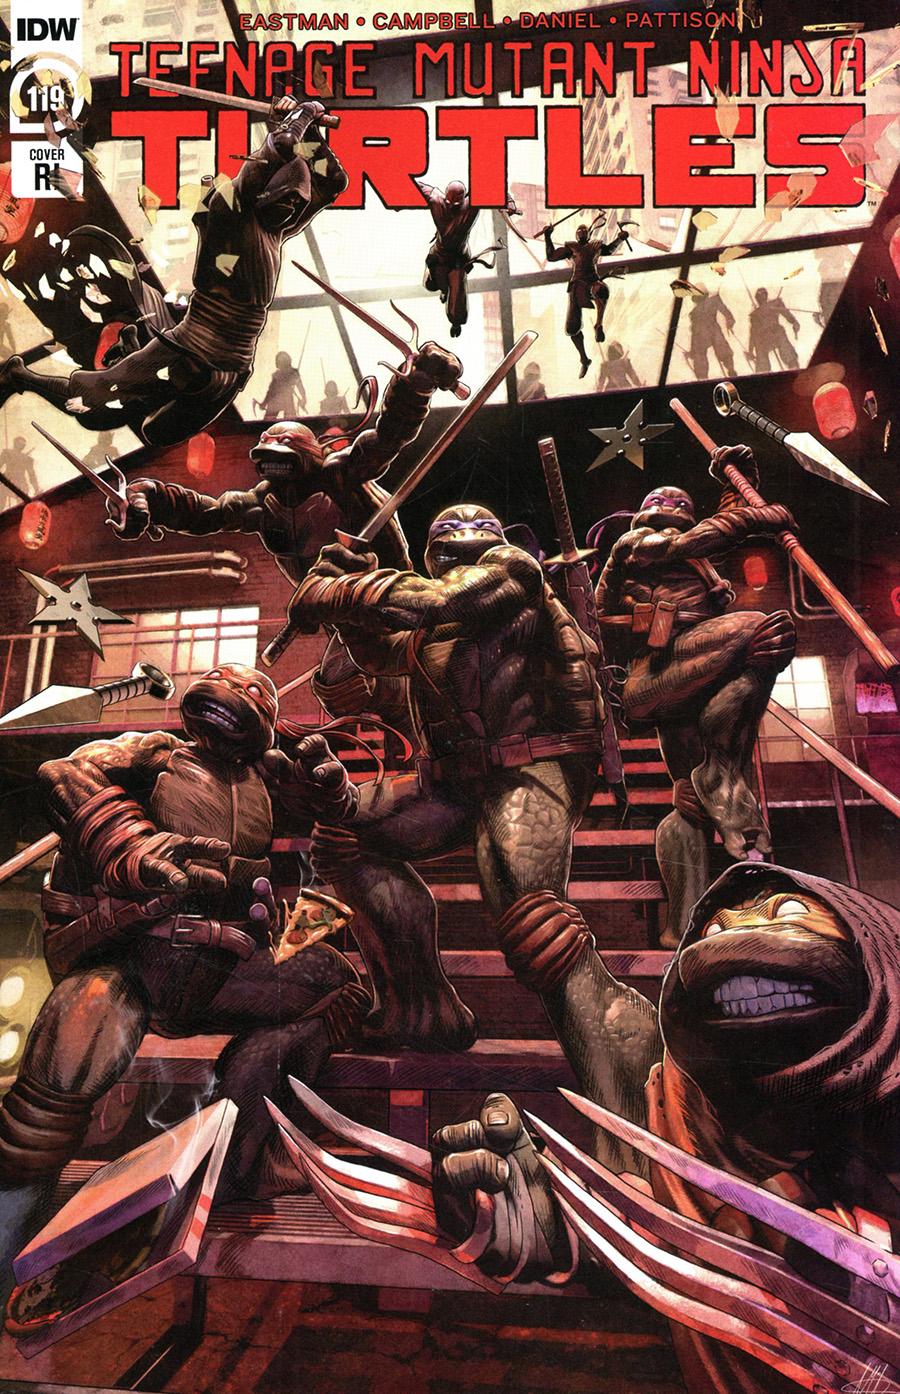 Teenage Mutant Ninja Turtles Vol 5 #119 Cover C Incentive Alex McArdell Variant Cover